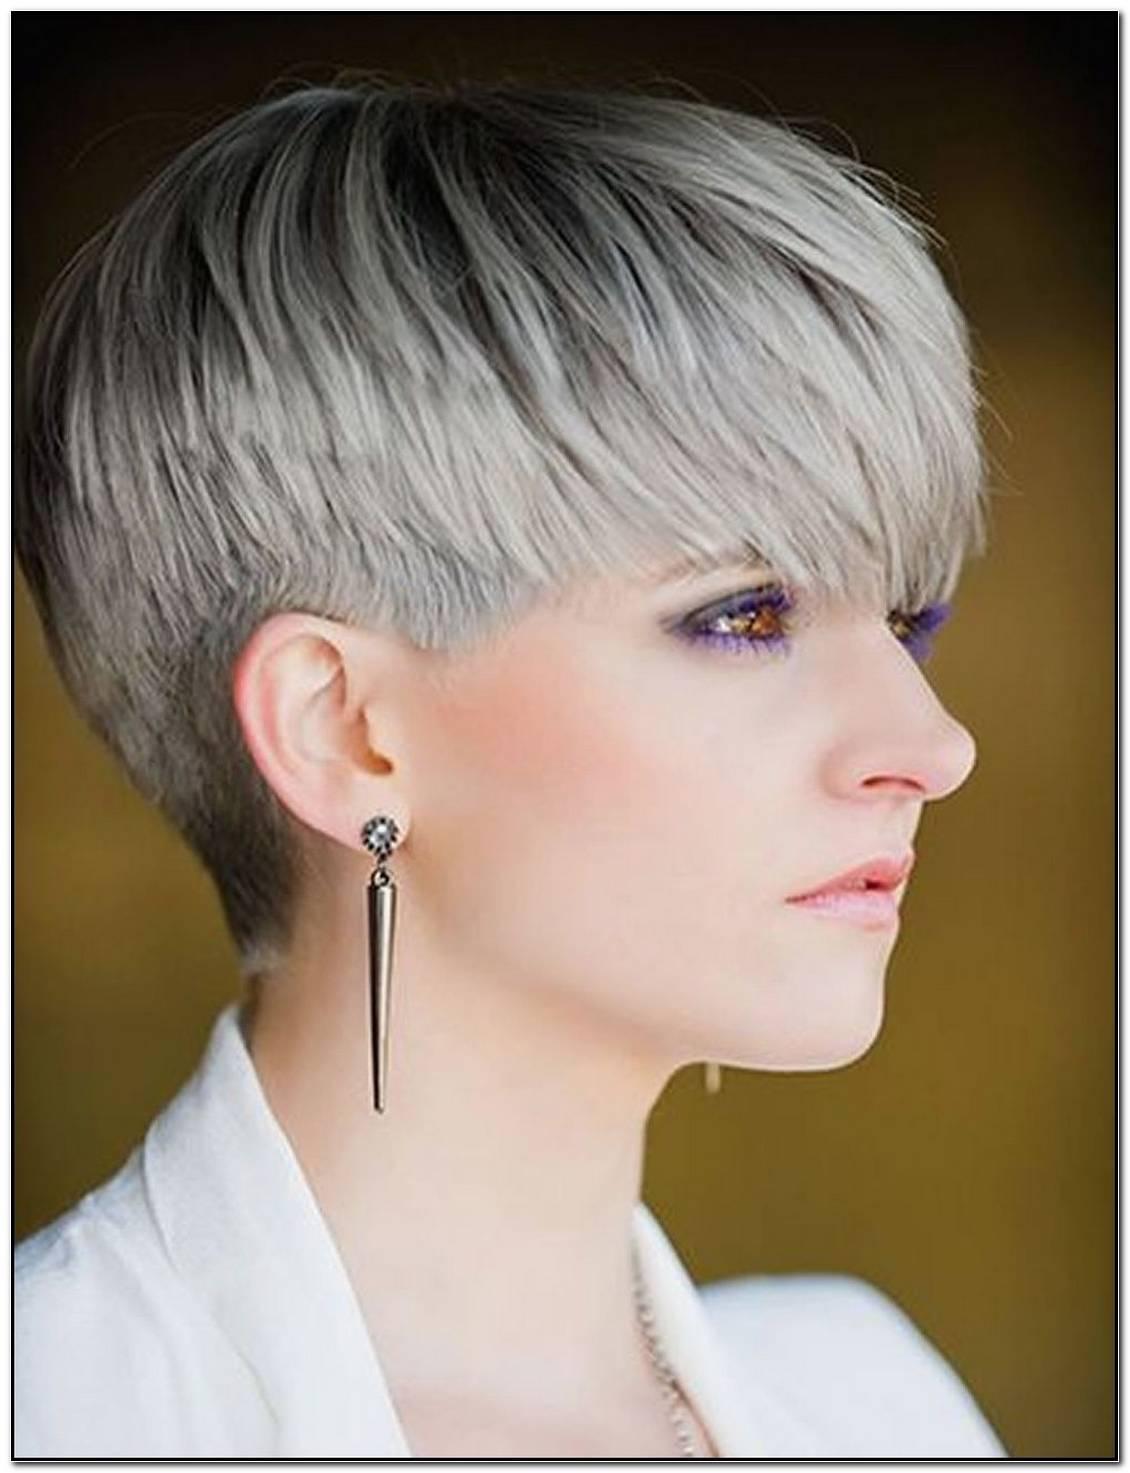 Frisuren Teenager Weiblich Kurz